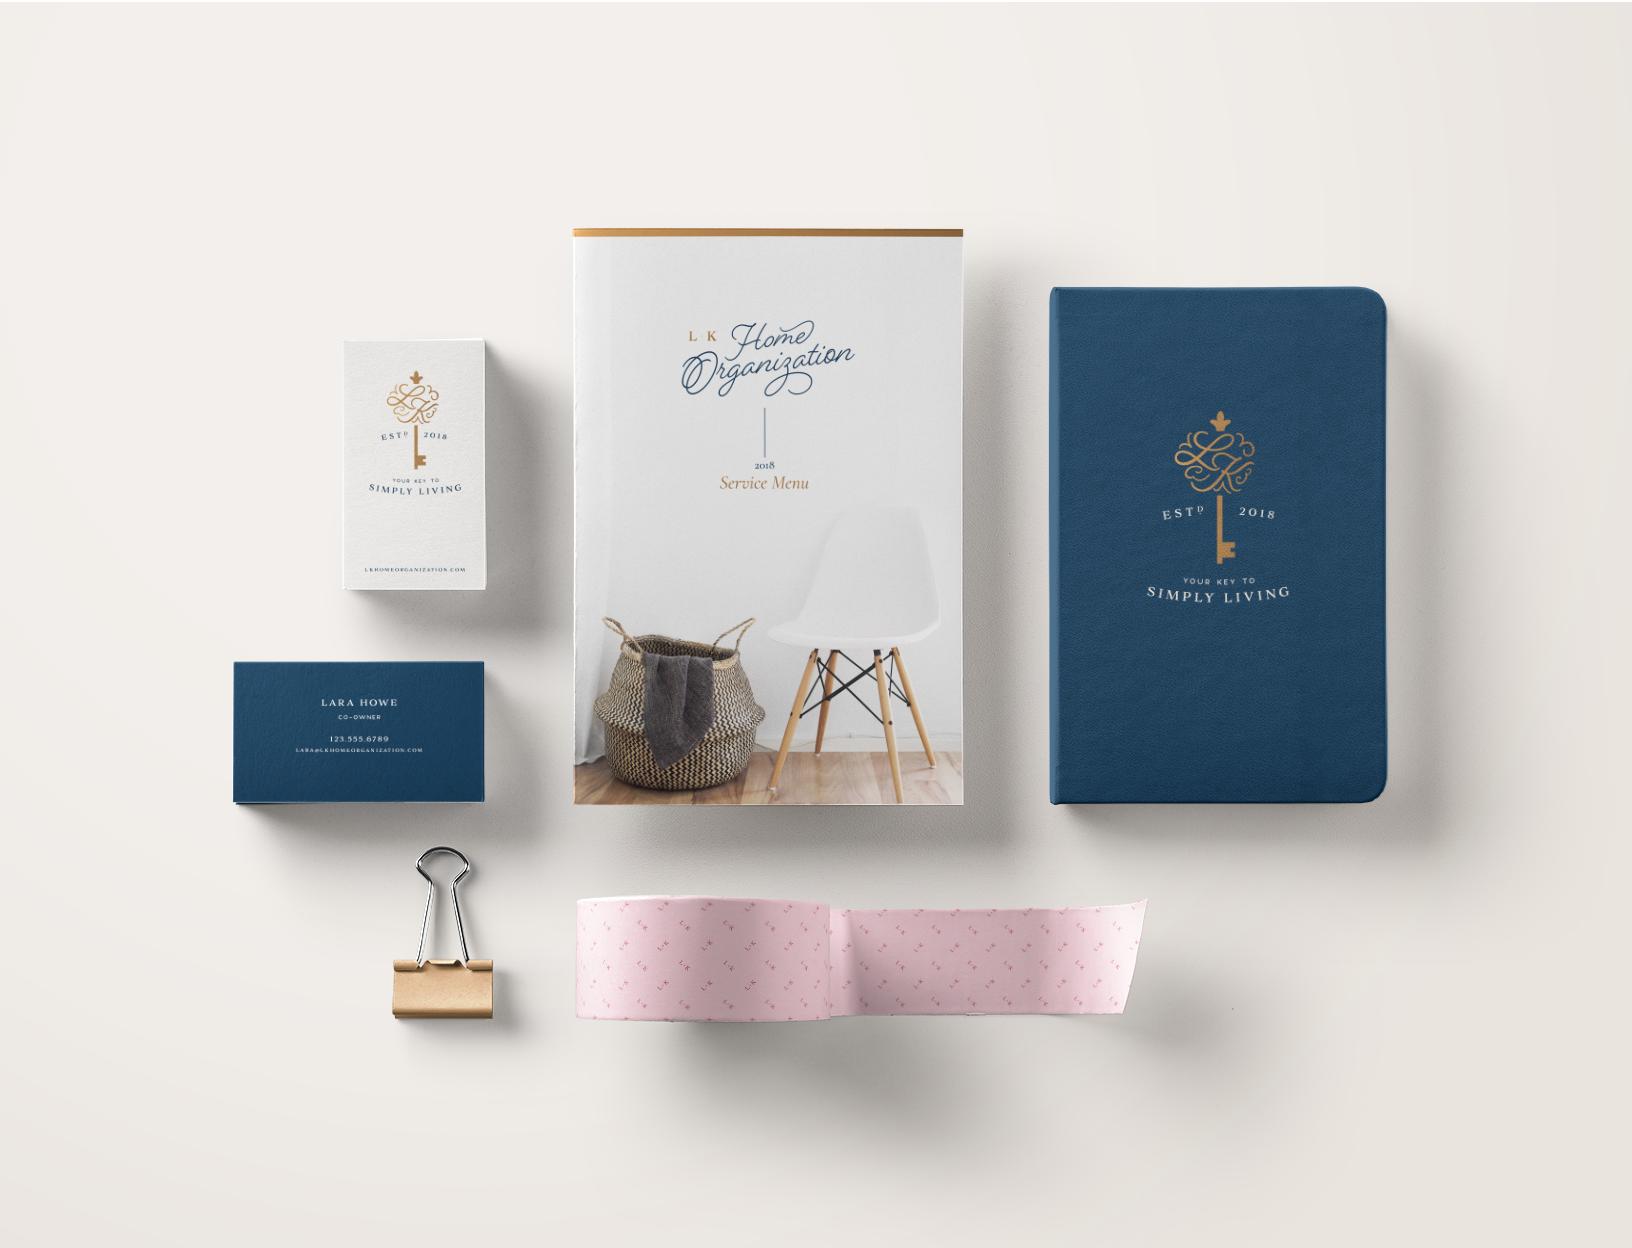 L+K Home Organization Brand Identity by Meghan Lambert